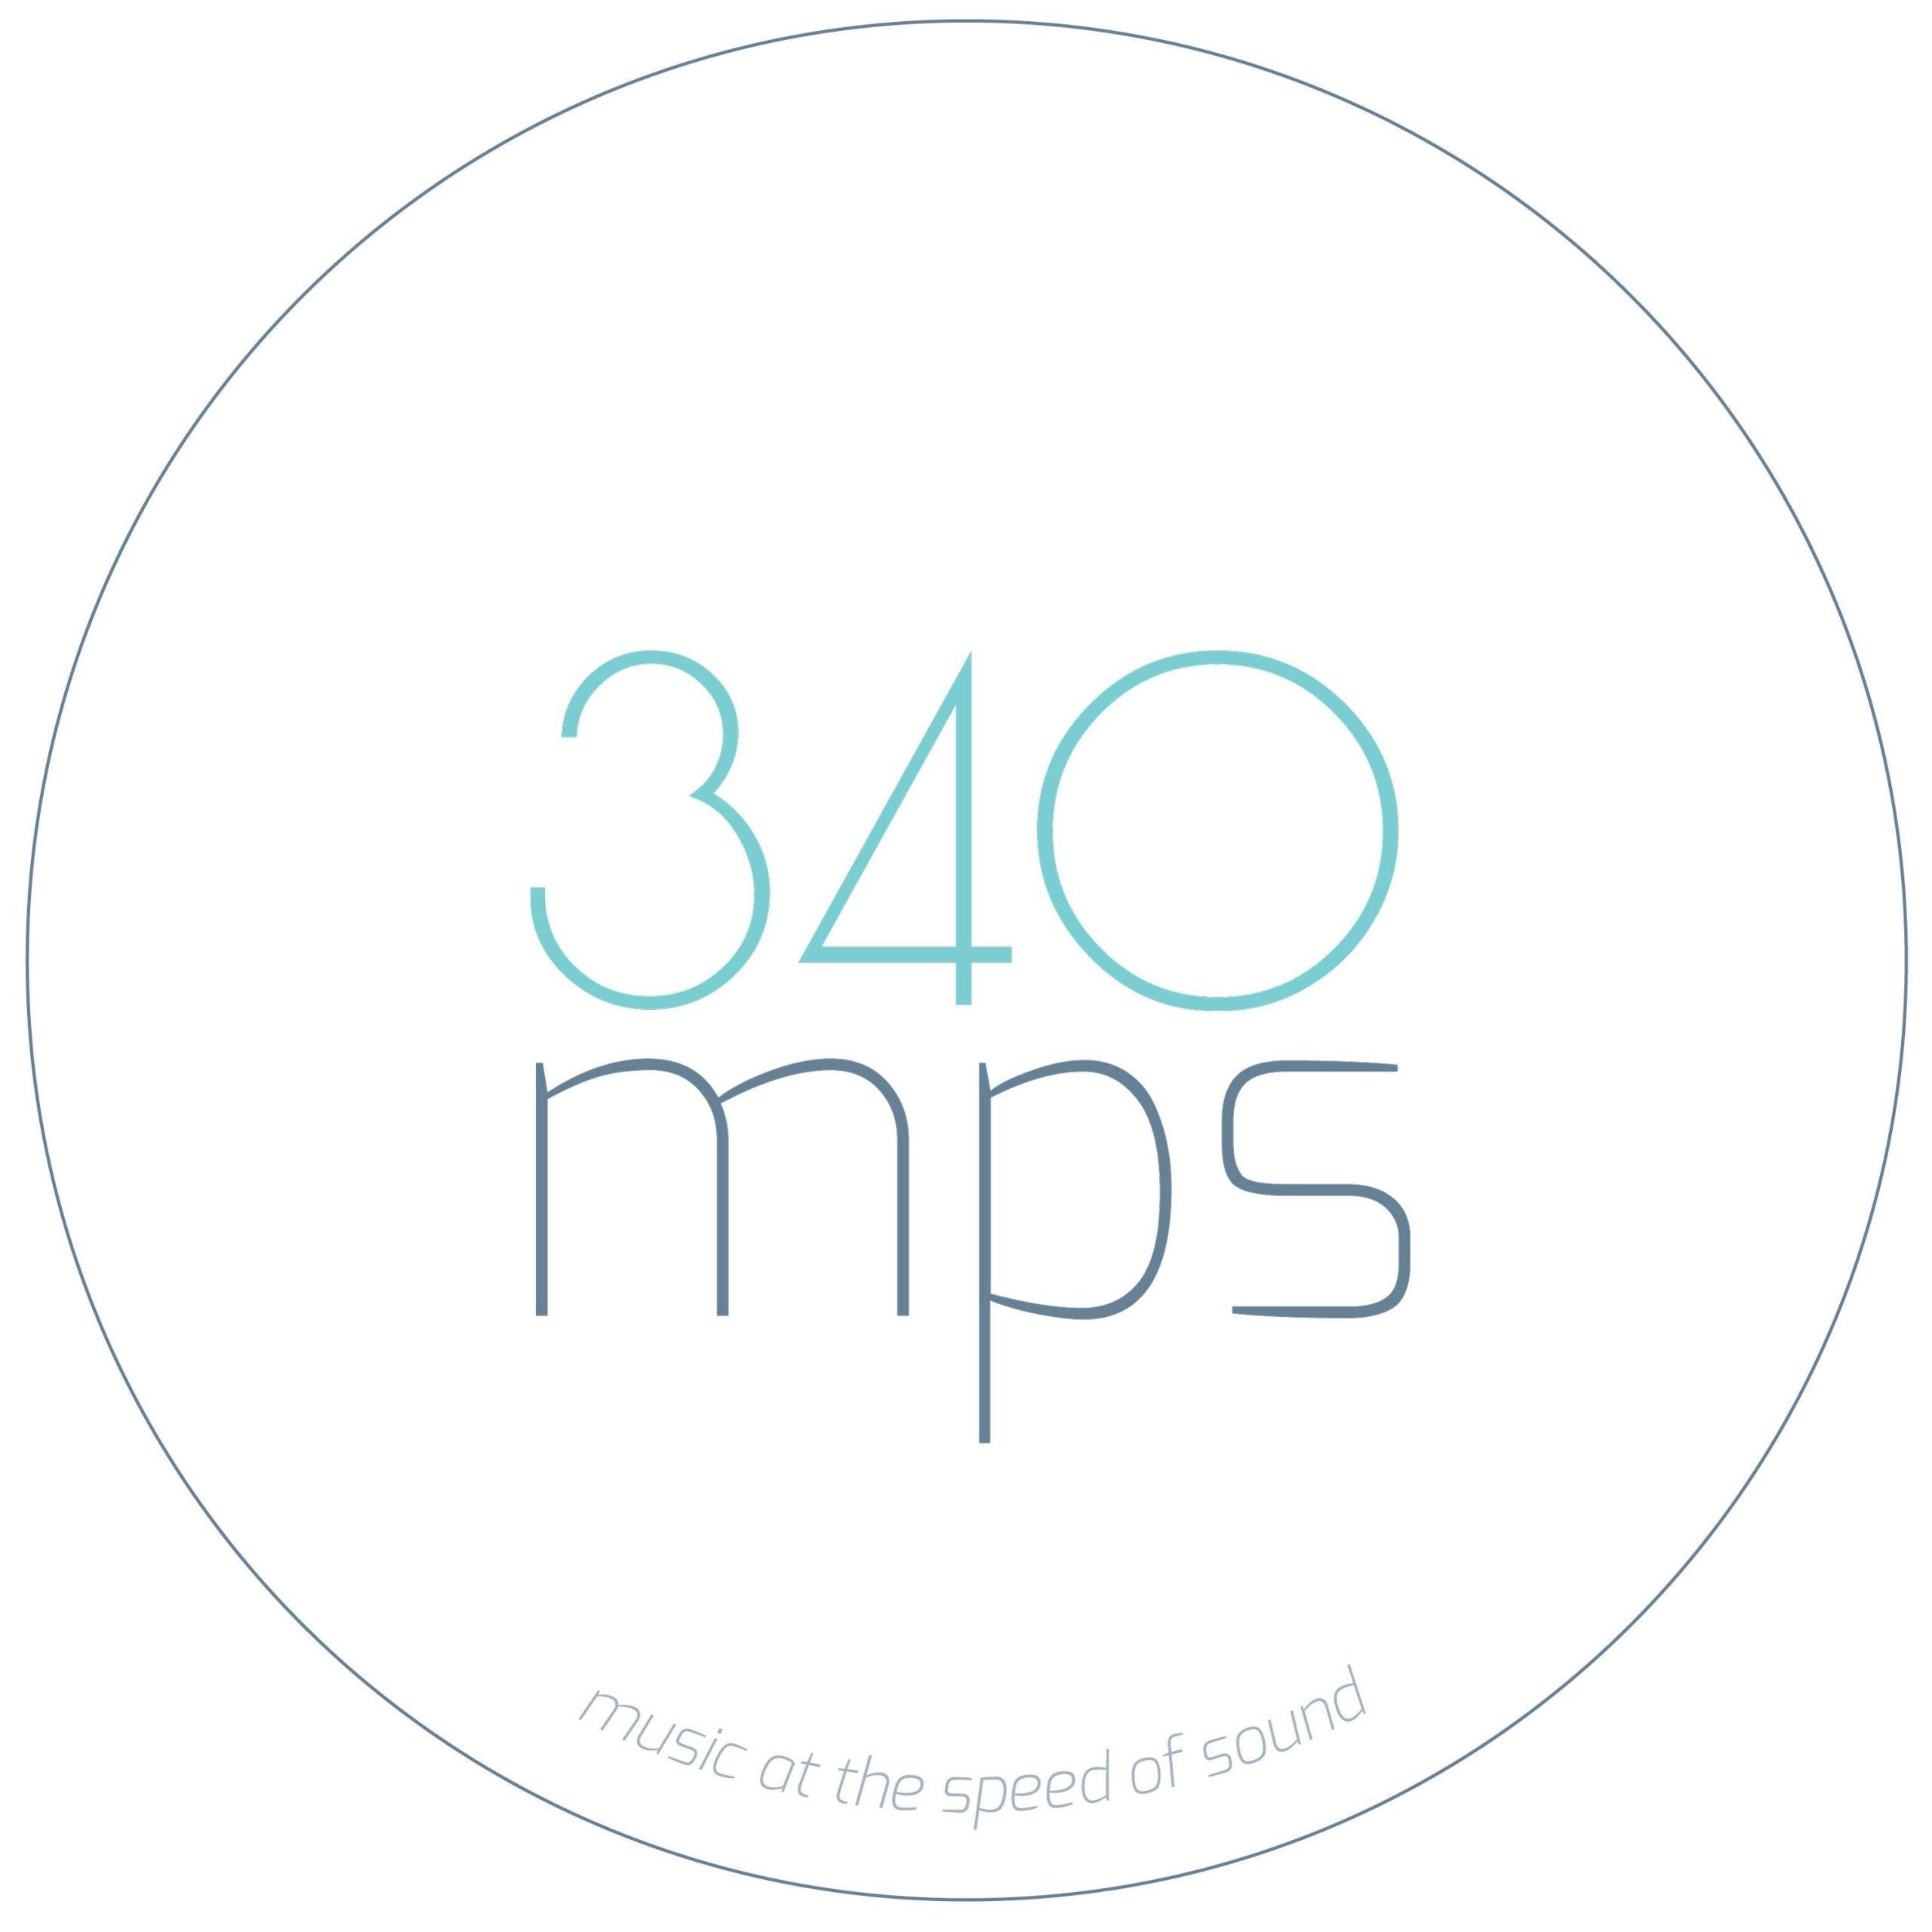 DJ 340MPS